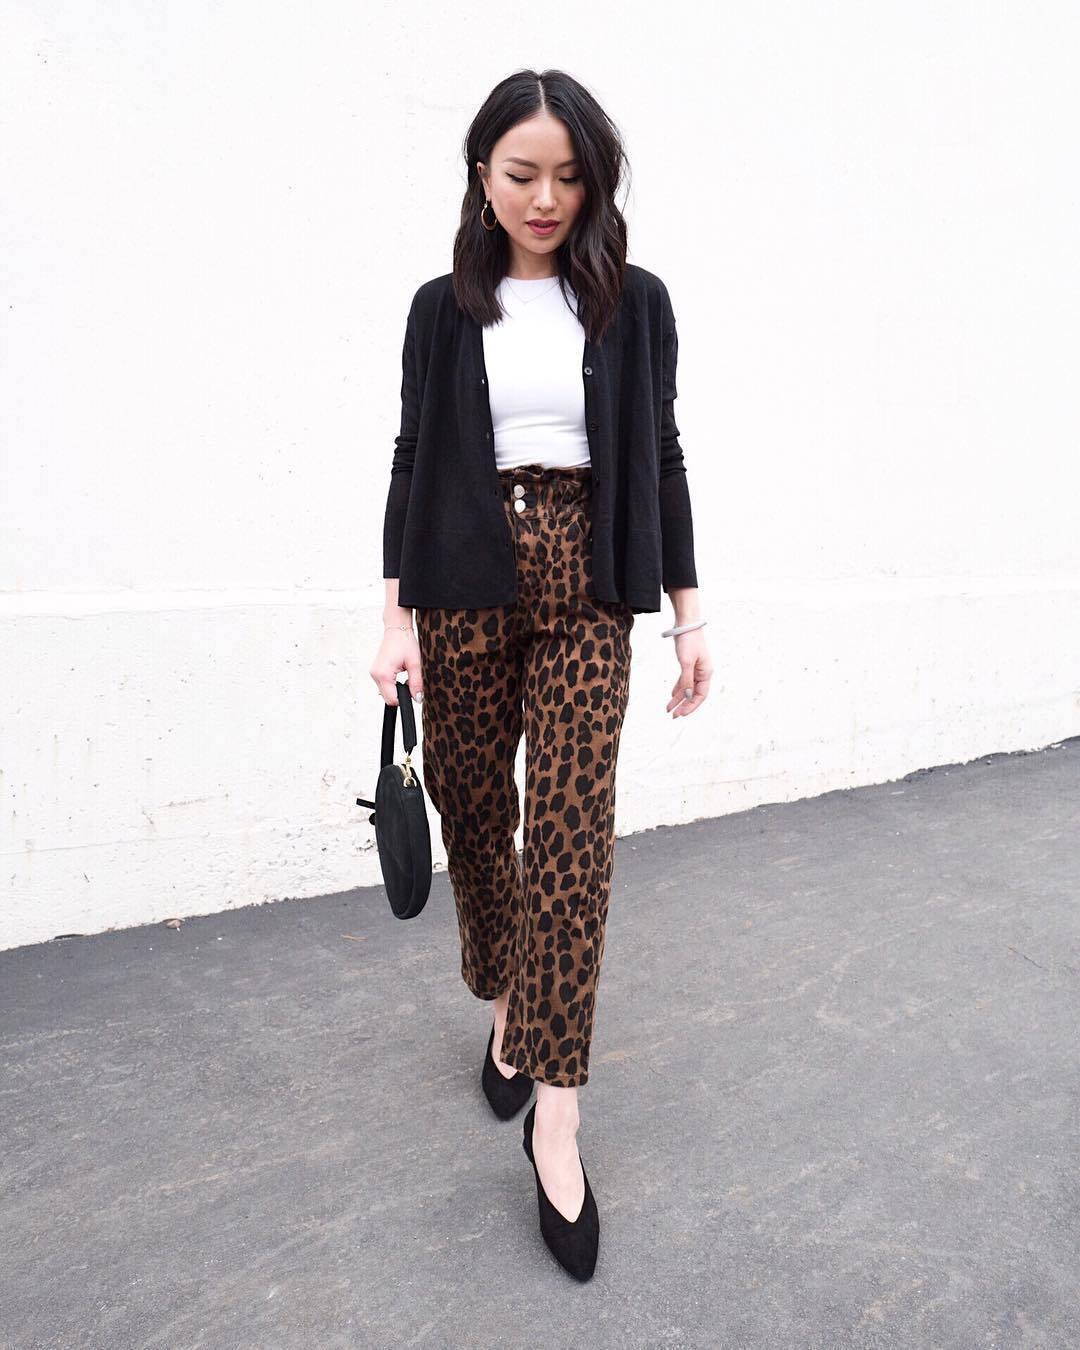 shoes pumps leopard print pants black bag white t-shirt black cardigan casual mid heel pumps